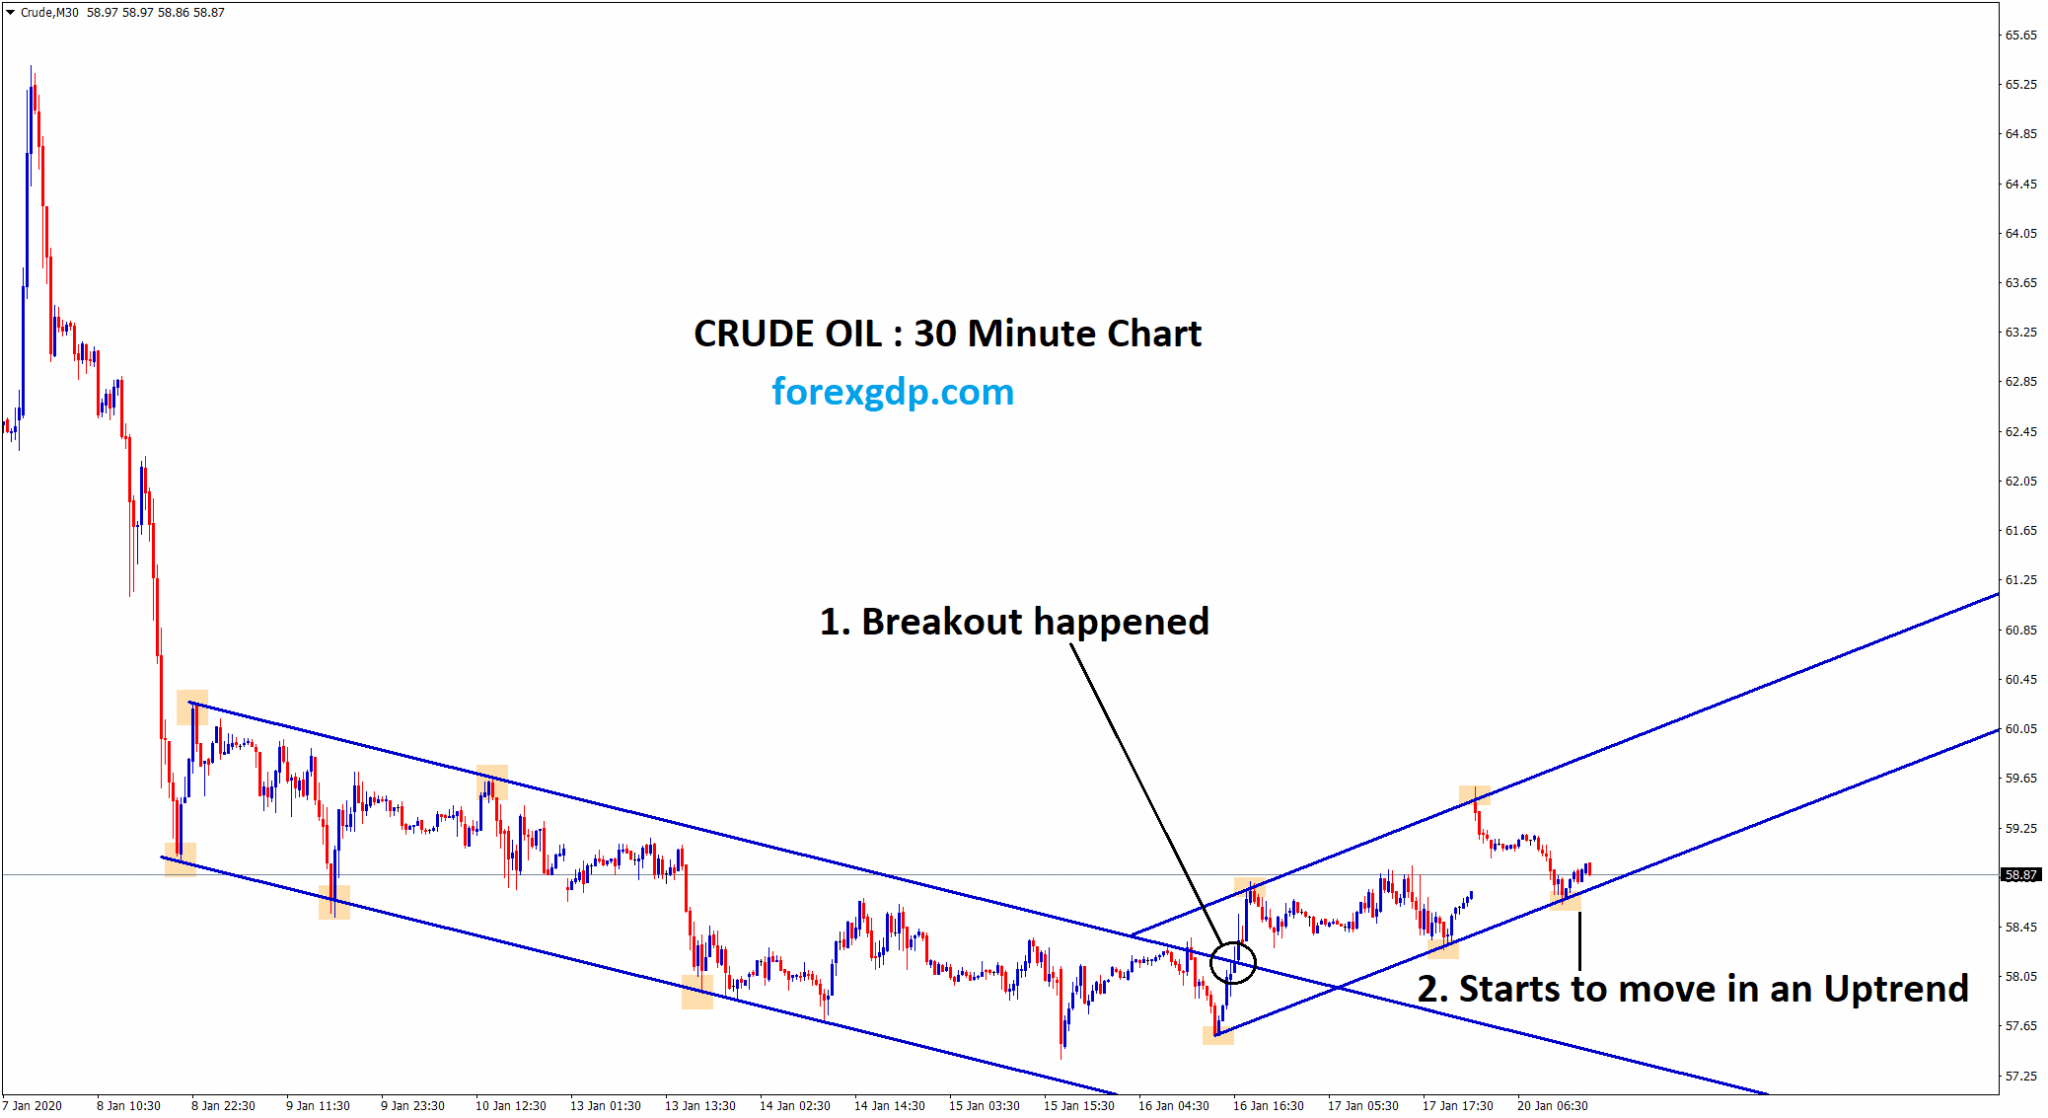 Crude Oil starts to move in uptrend